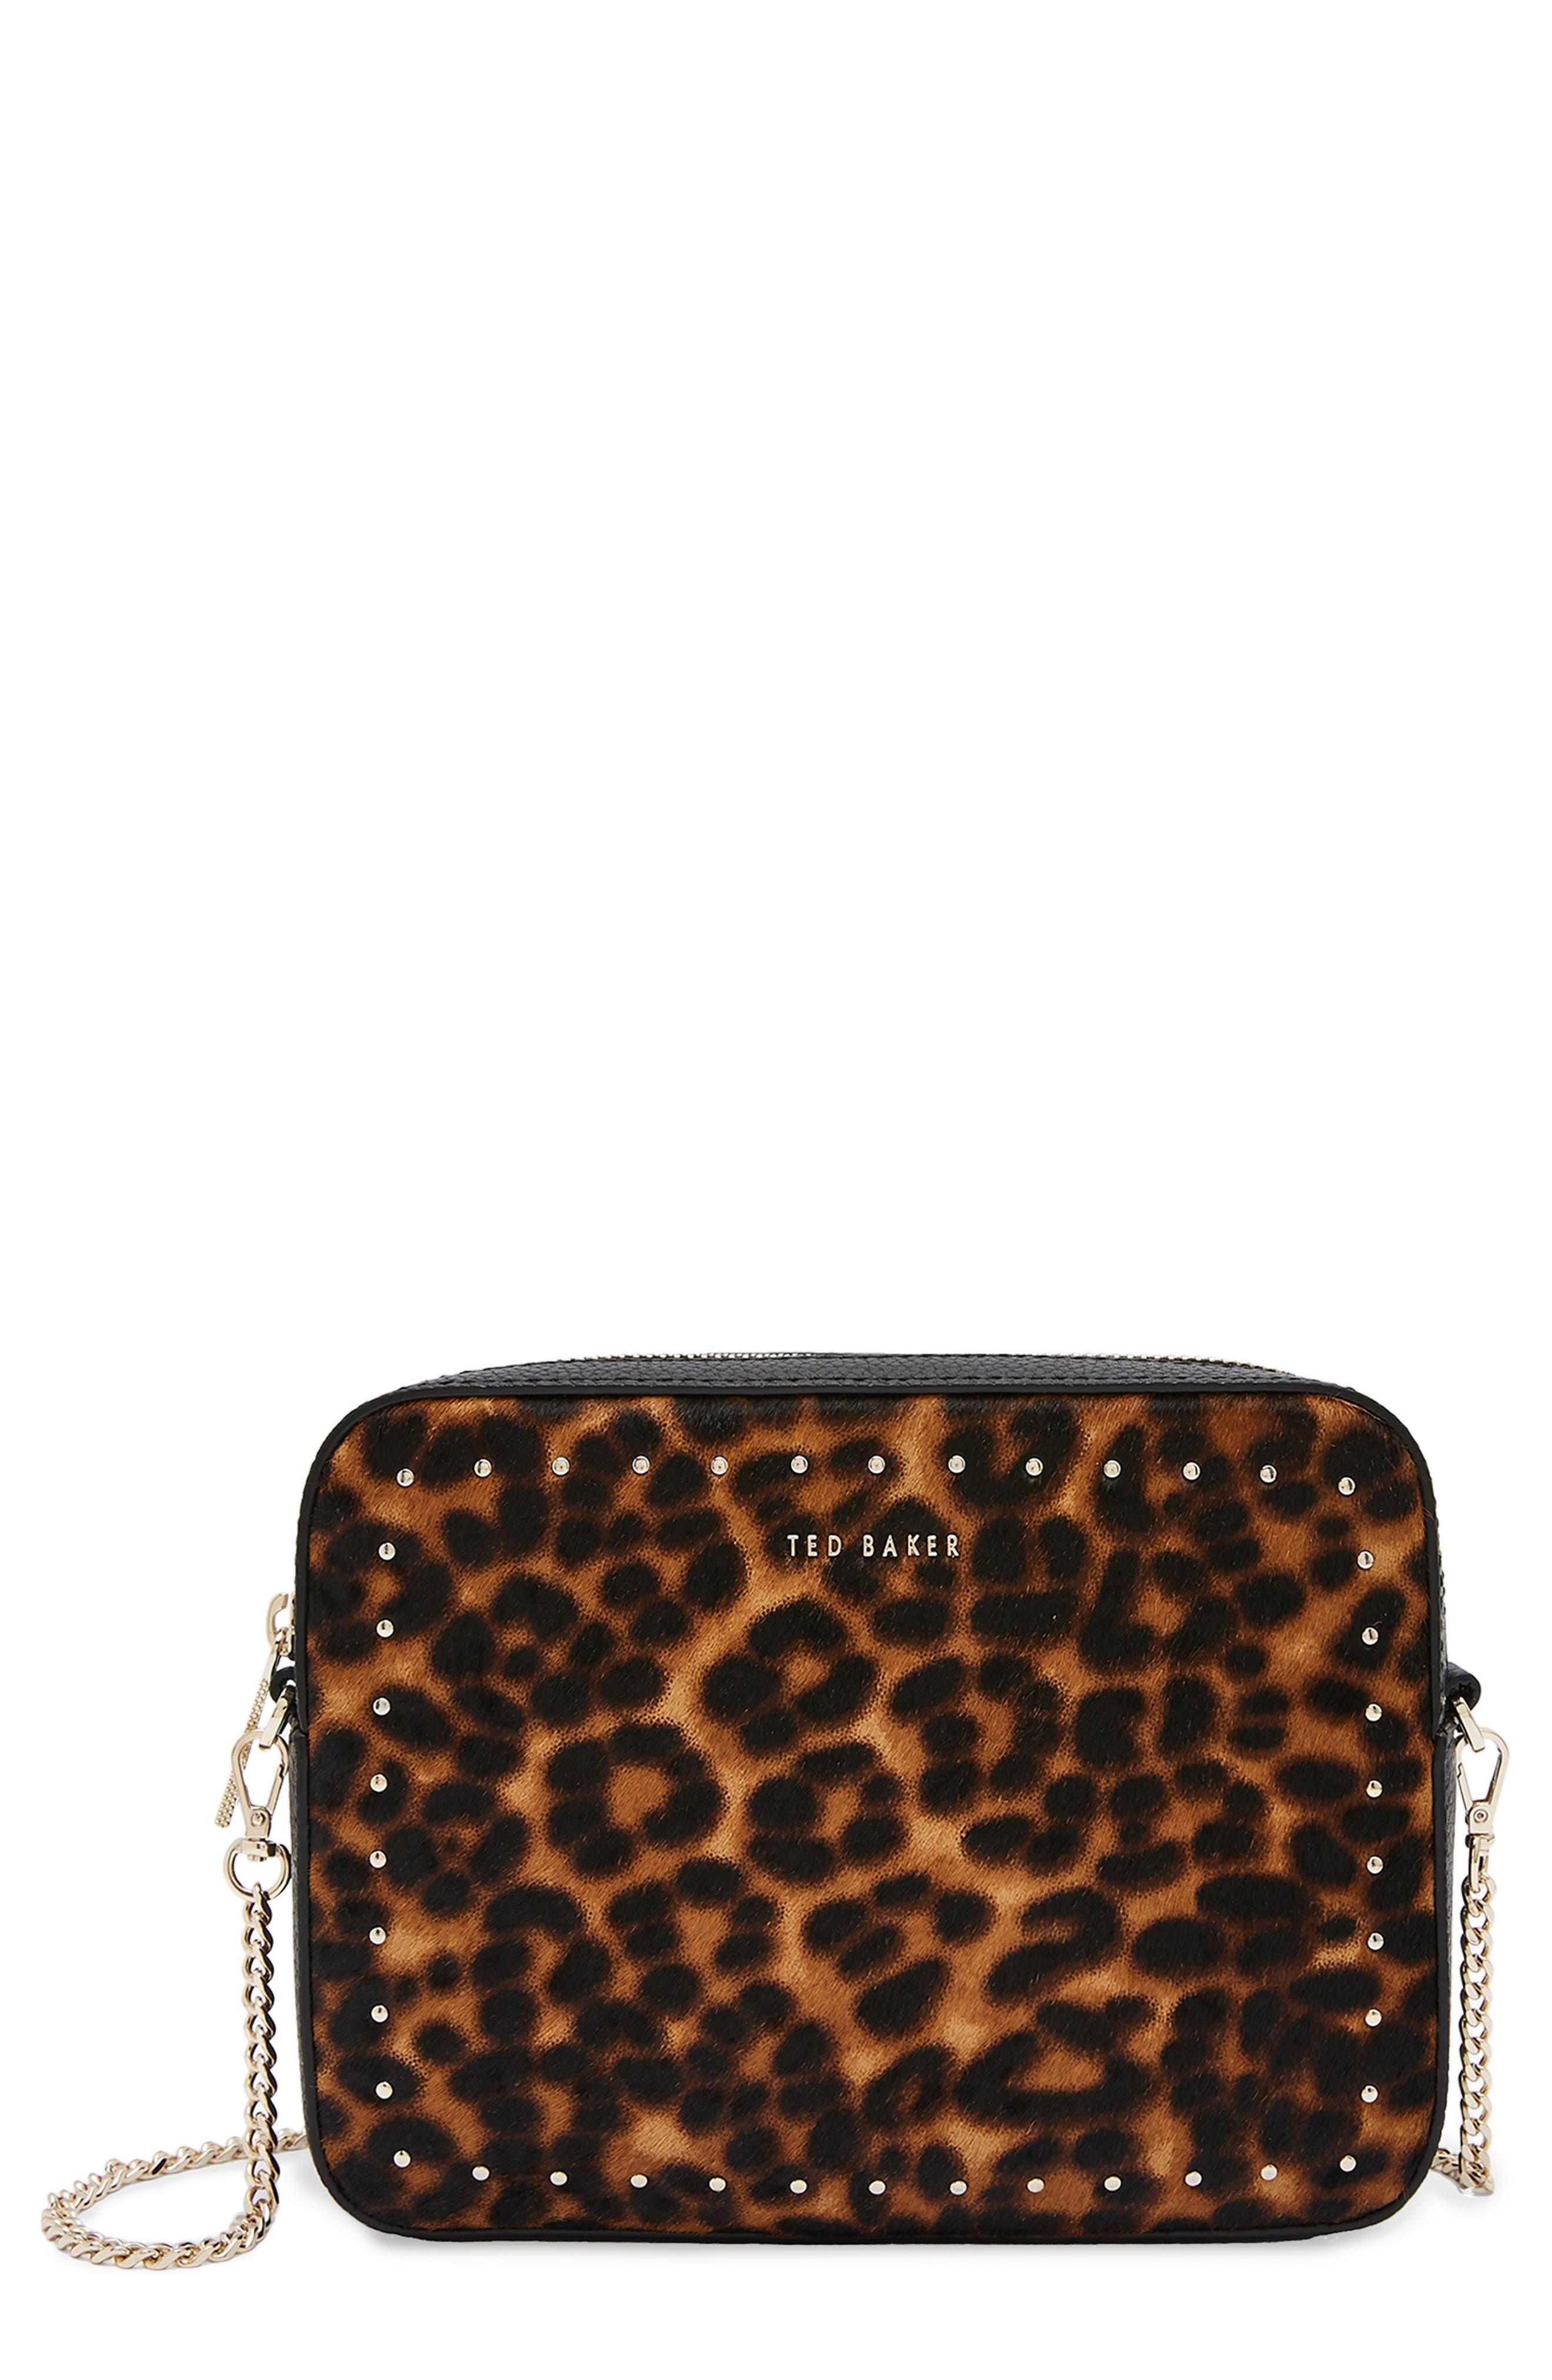 Savanna Leather Crossbody Bag - Black